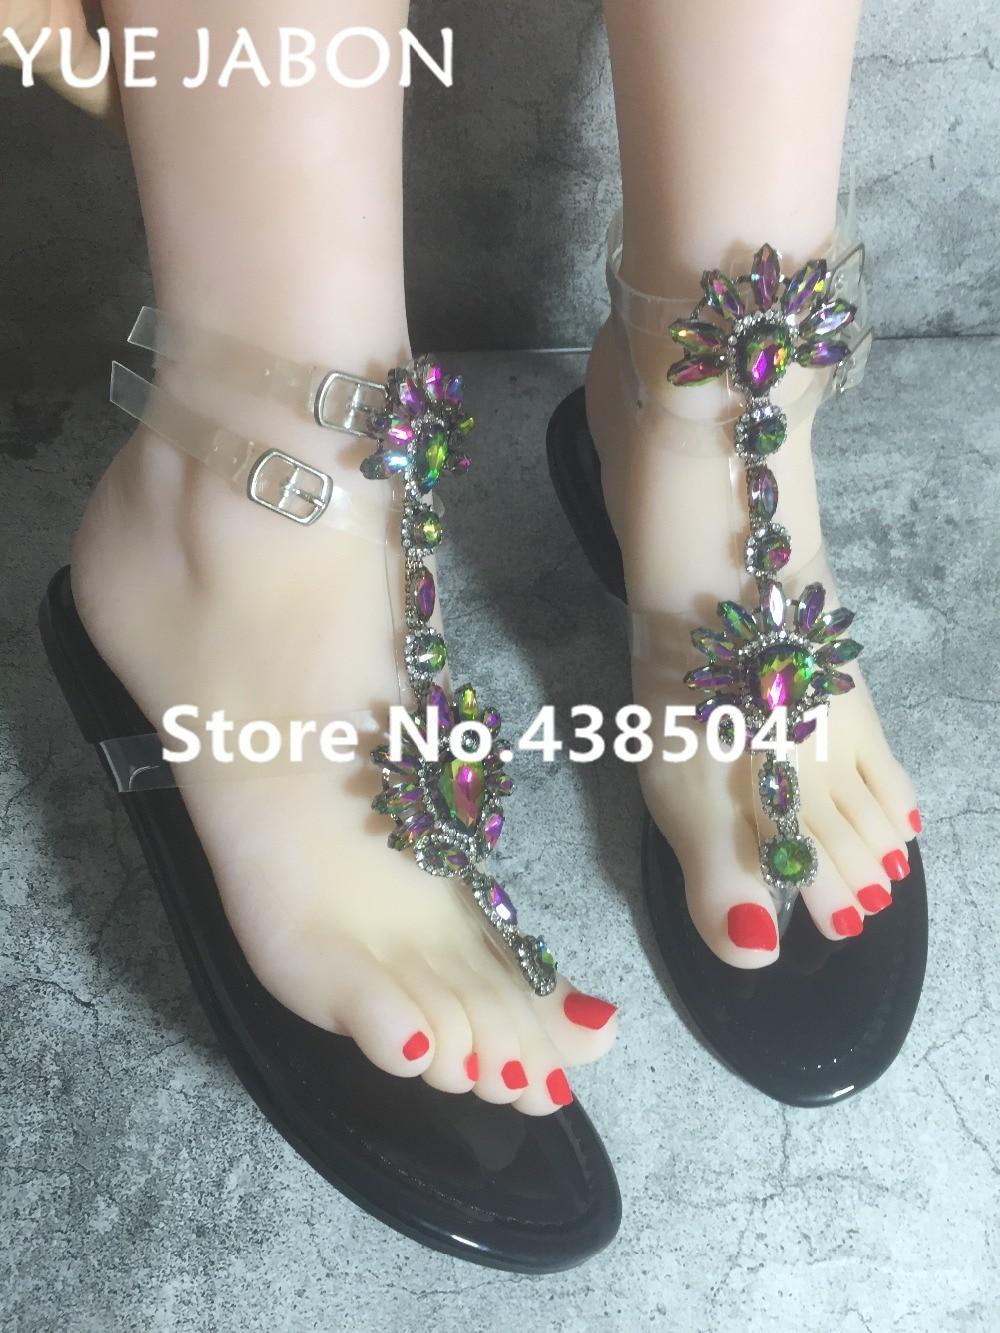 HTB10k.VAoR1BeNjy0Fmq6z0wVXa7 2019 shoes woman sandals women Rhinestones Chains Flat Sandals Thong Crystal Flip Flops sandals gladiator sandals 43 free ship